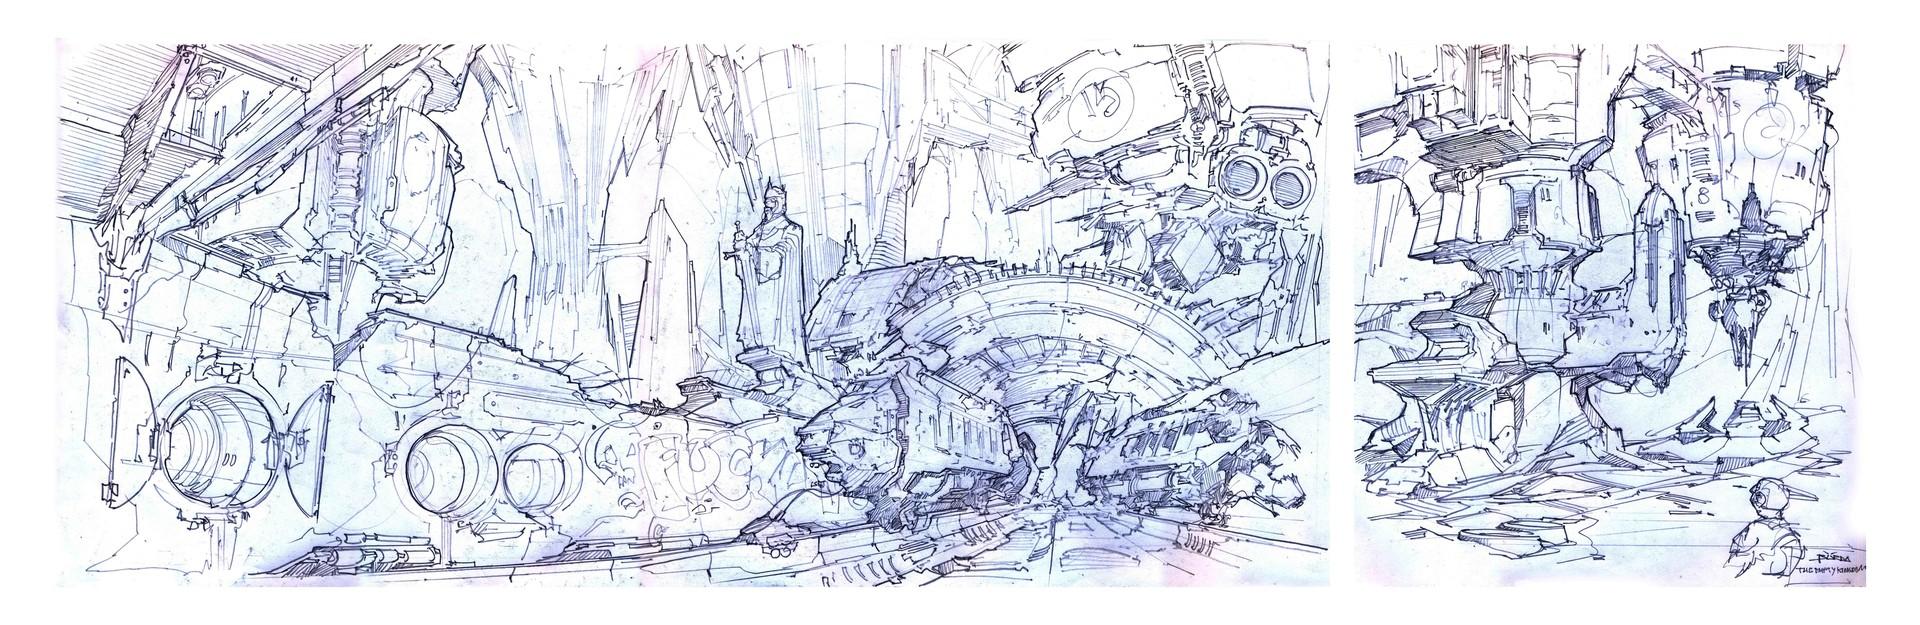 Alejandro burdisio bocetos the empty kingdom lamina6